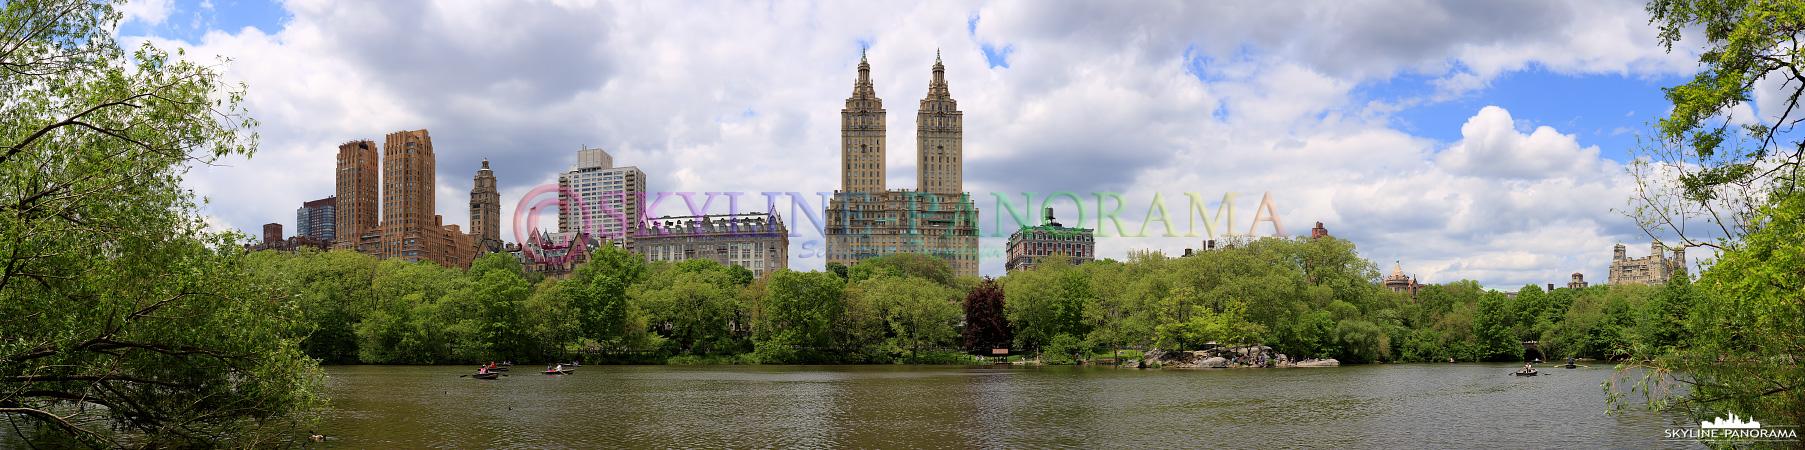 Panorama New York City - Blick über den Central Park Lake in Richtung der bekannten Zwillingstürmen des San Remo.